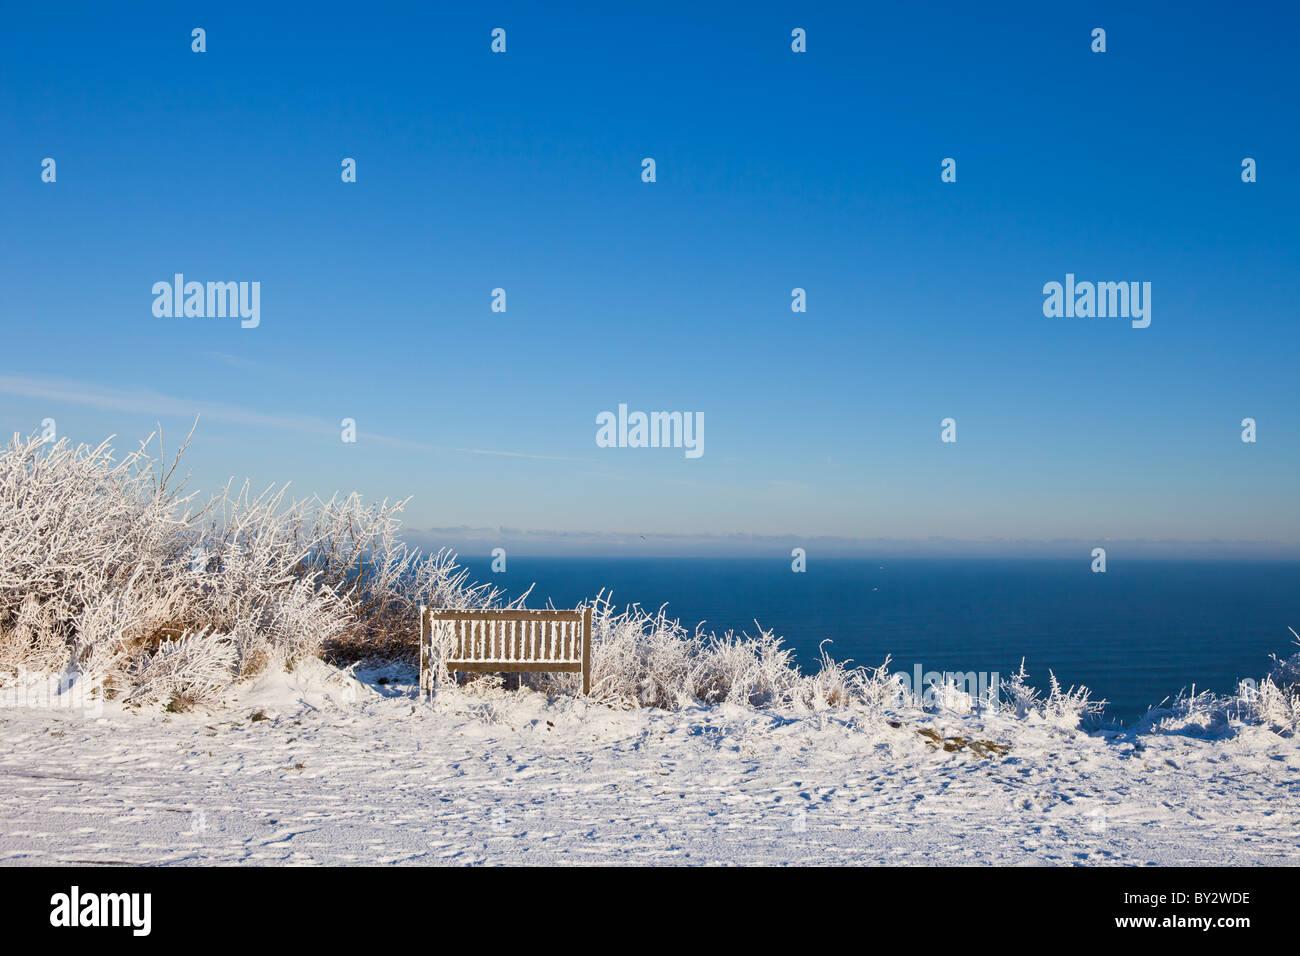 Snow covered scene, winter 2010 Stock Photo